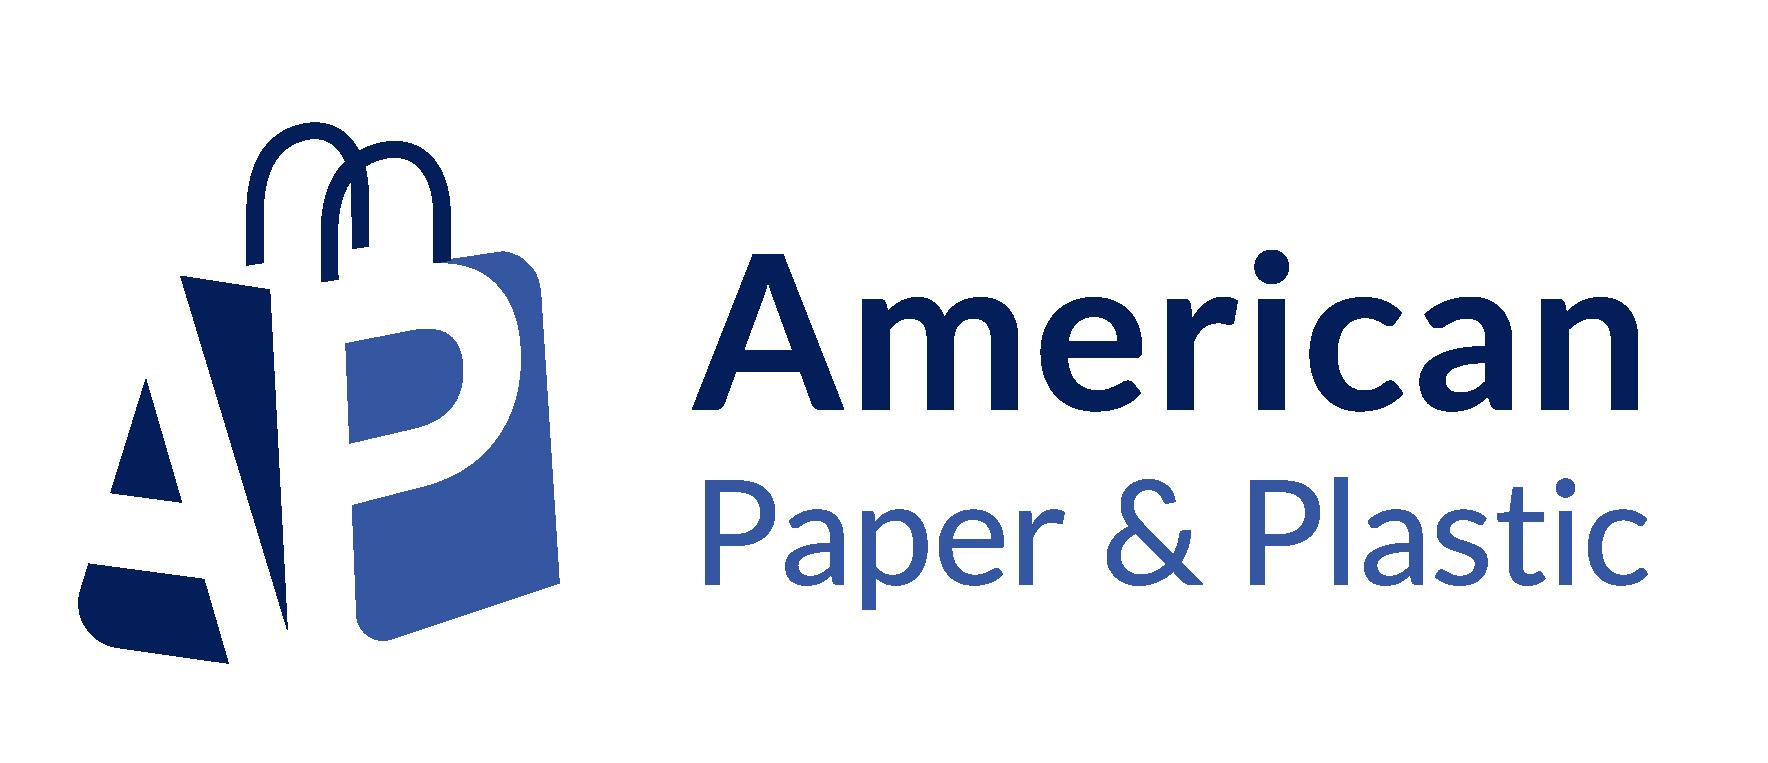 American Paper & Plastic